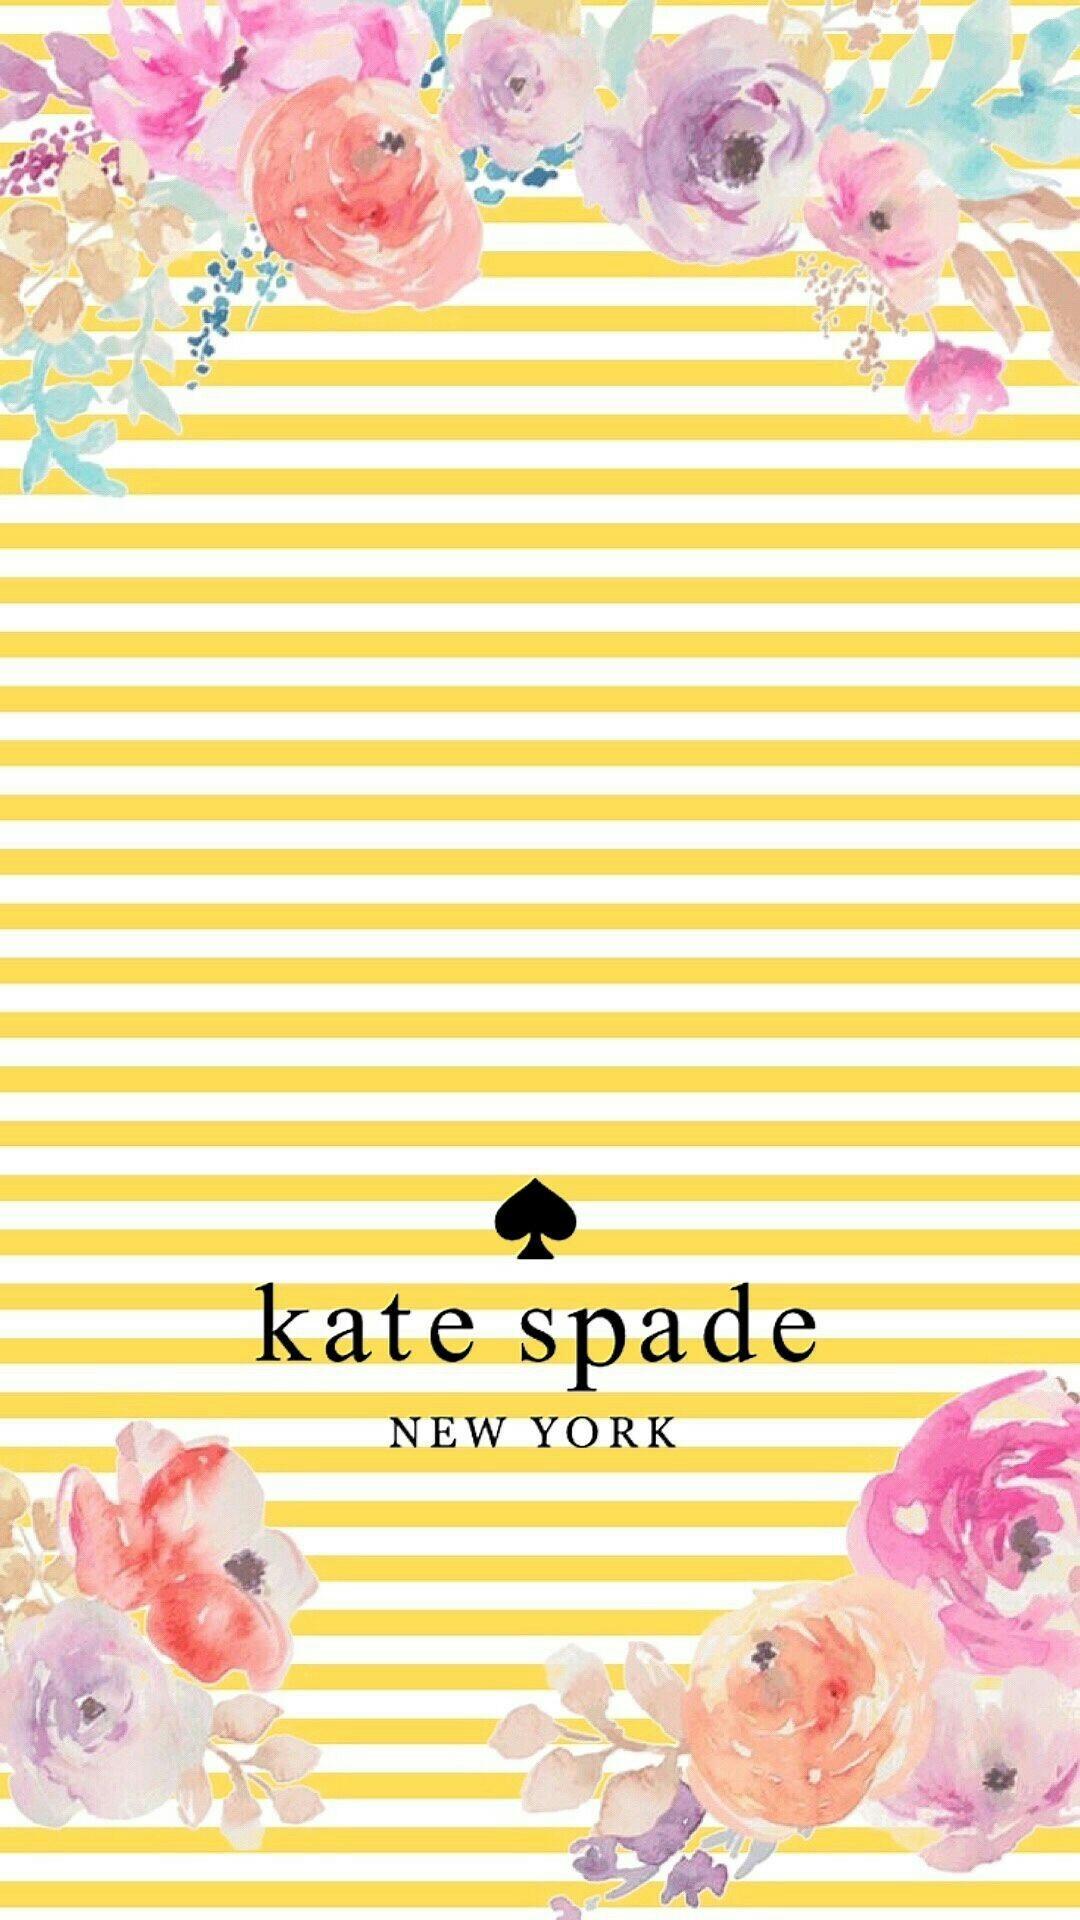 Kate Spade Wallpaper 57 Images